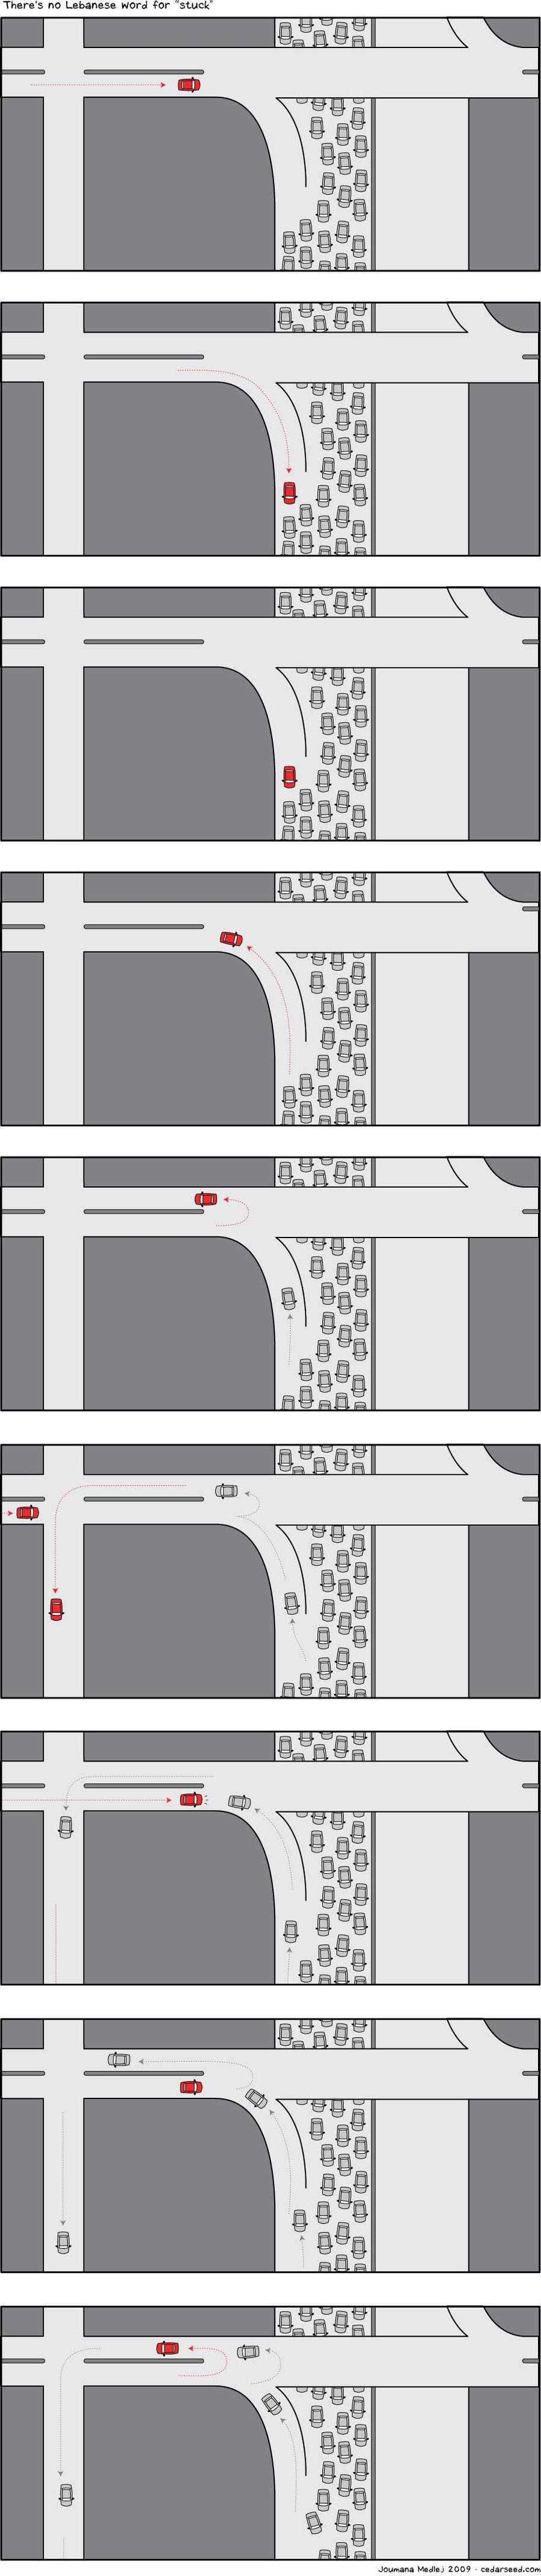 Lebanese Driver Manual 5 by Majnouna